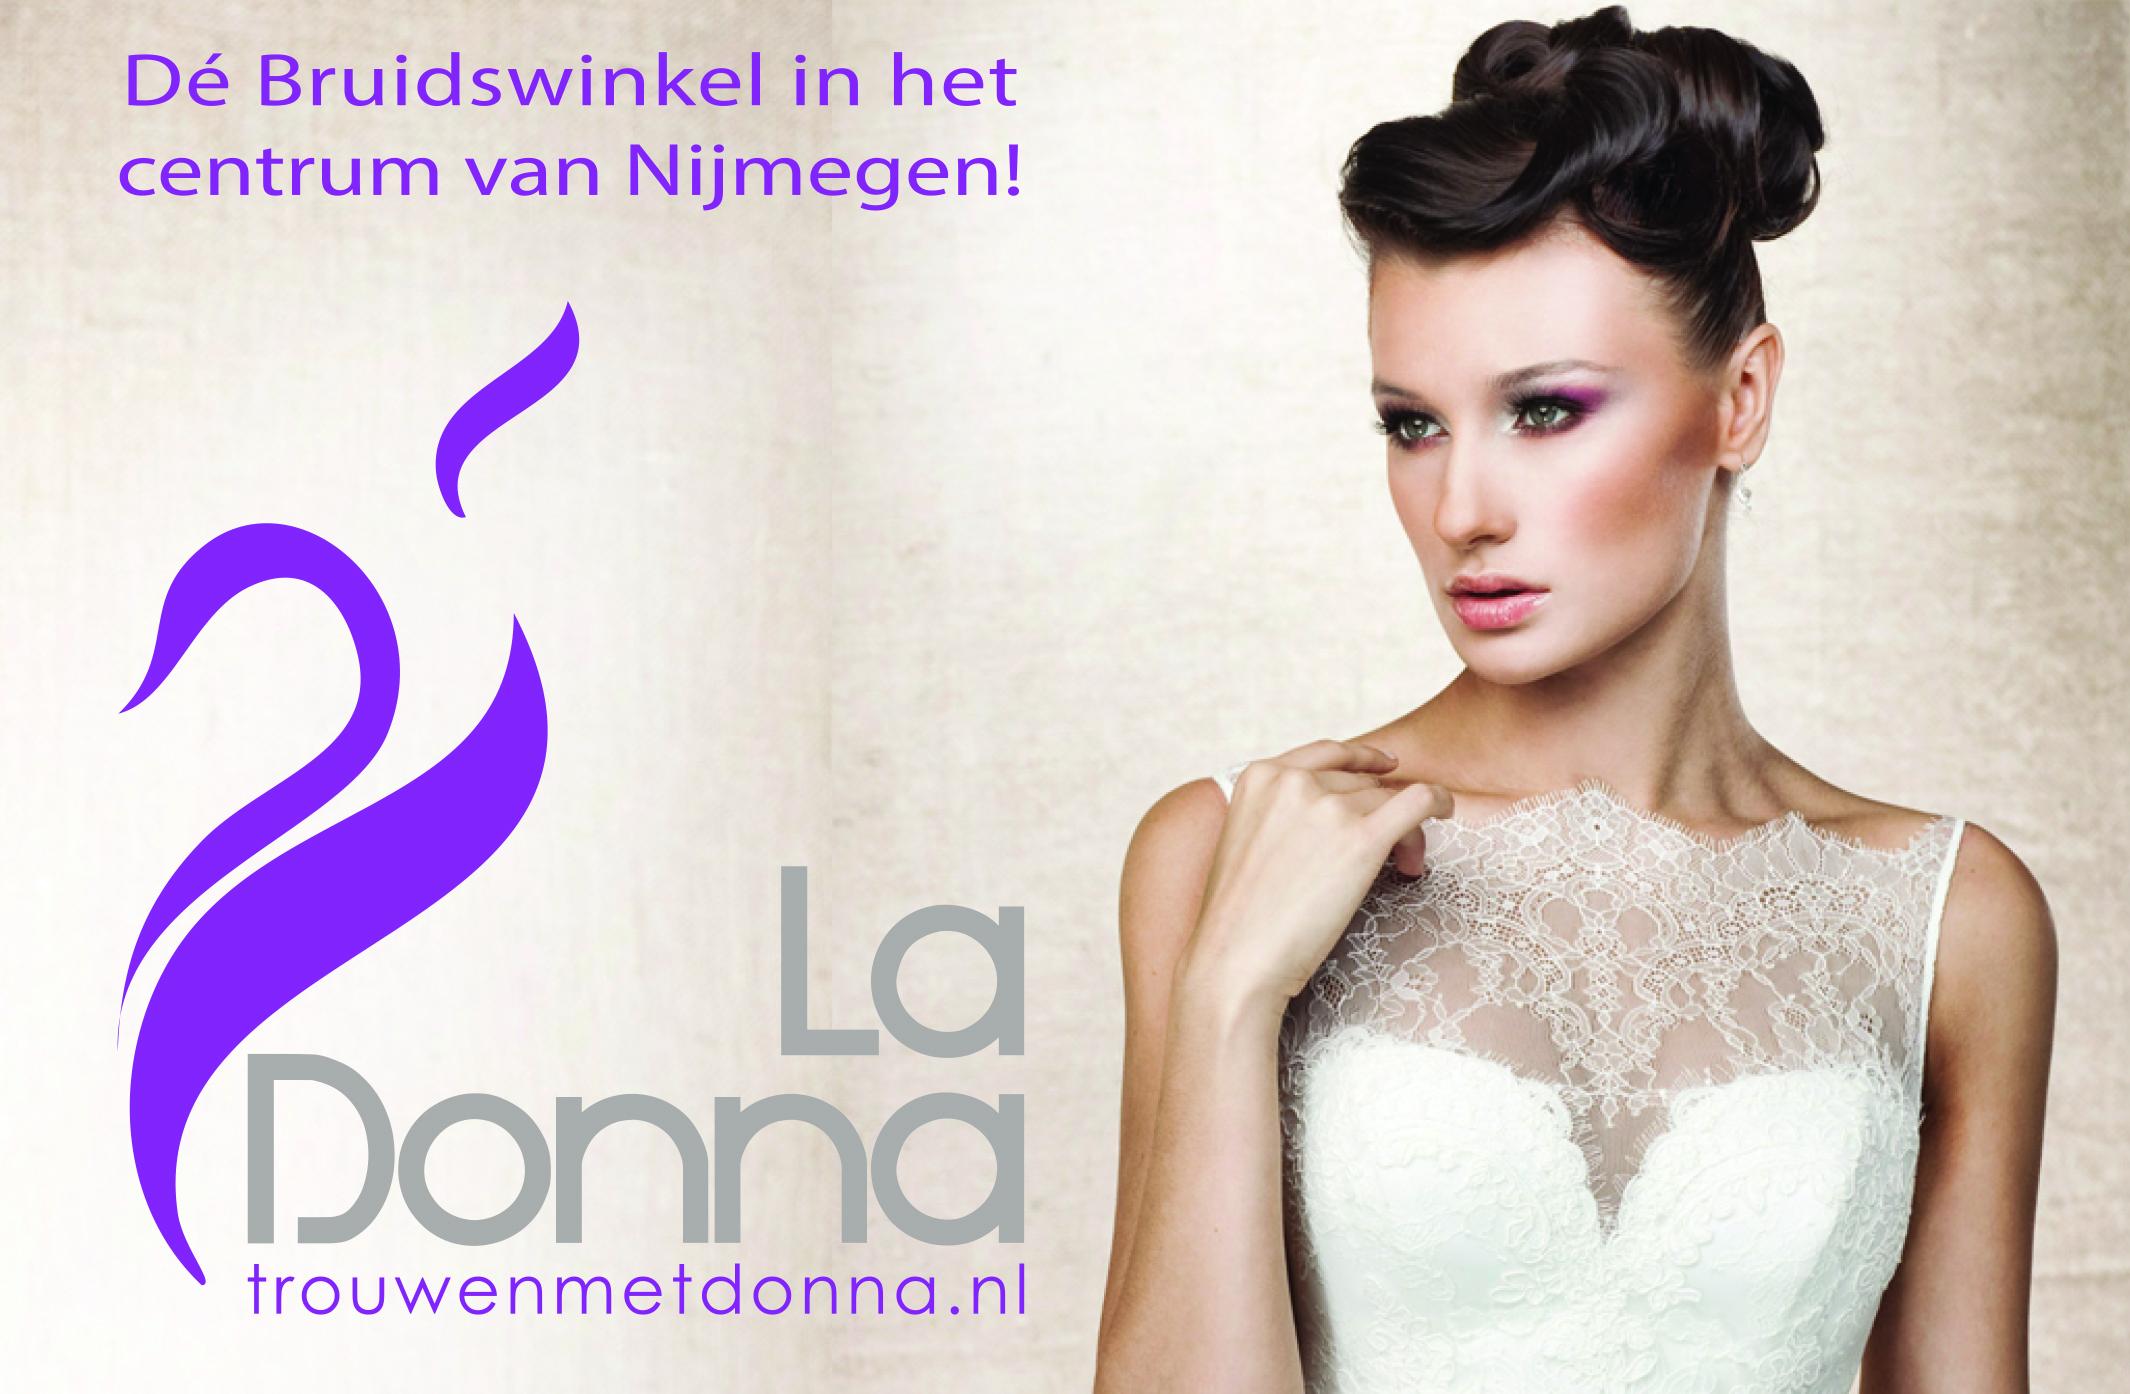 Bruidswinkel LaDonna